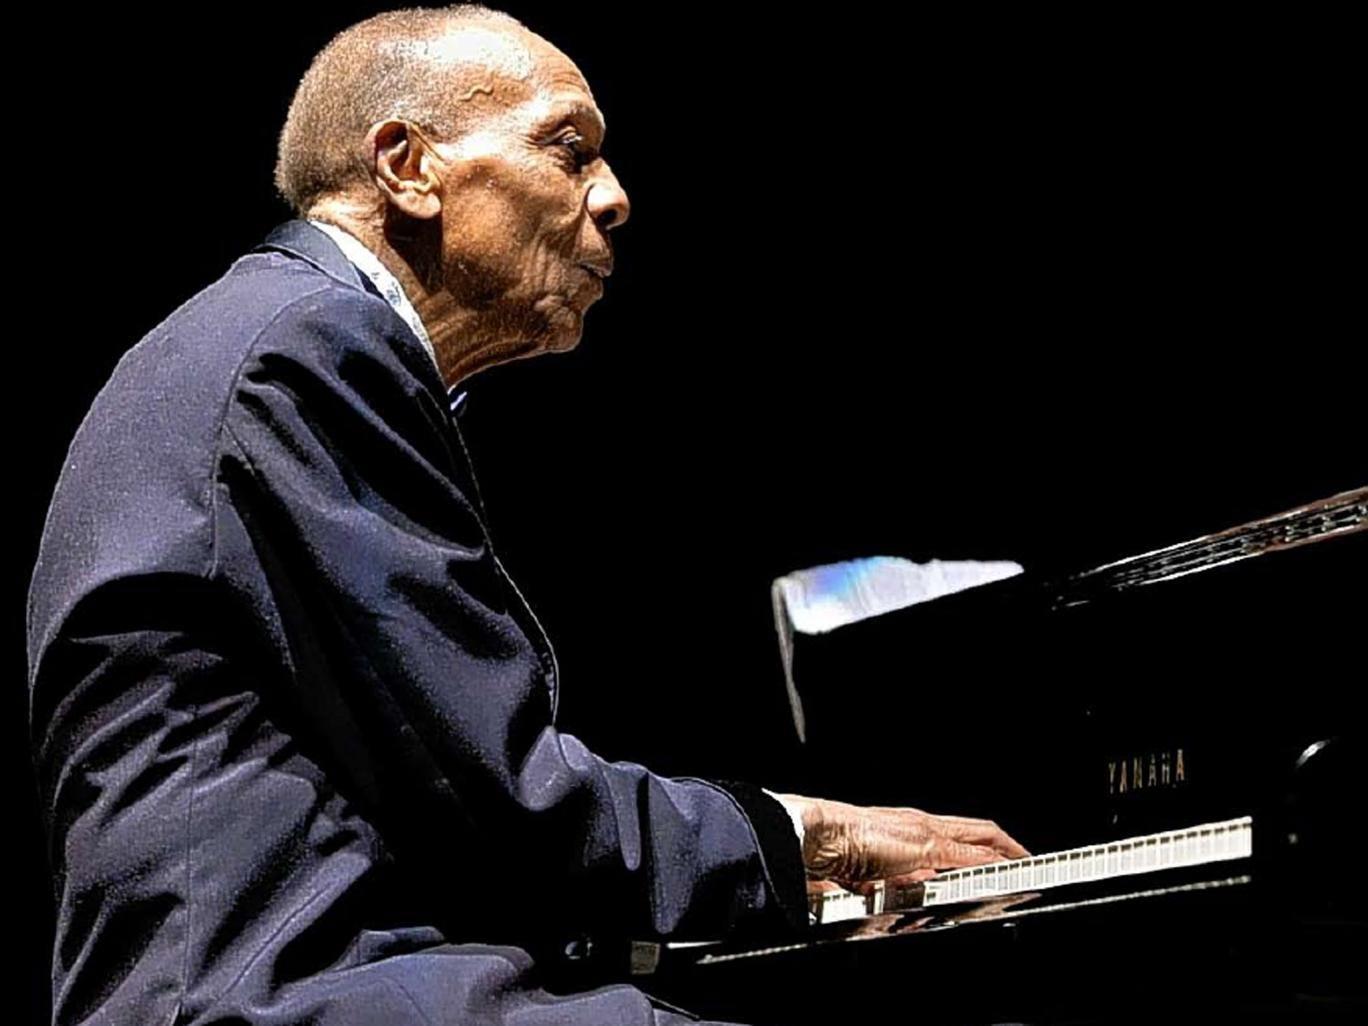 Bebo Valdes in 2005, performing at the 10th International Jazz Festival in Uruguay